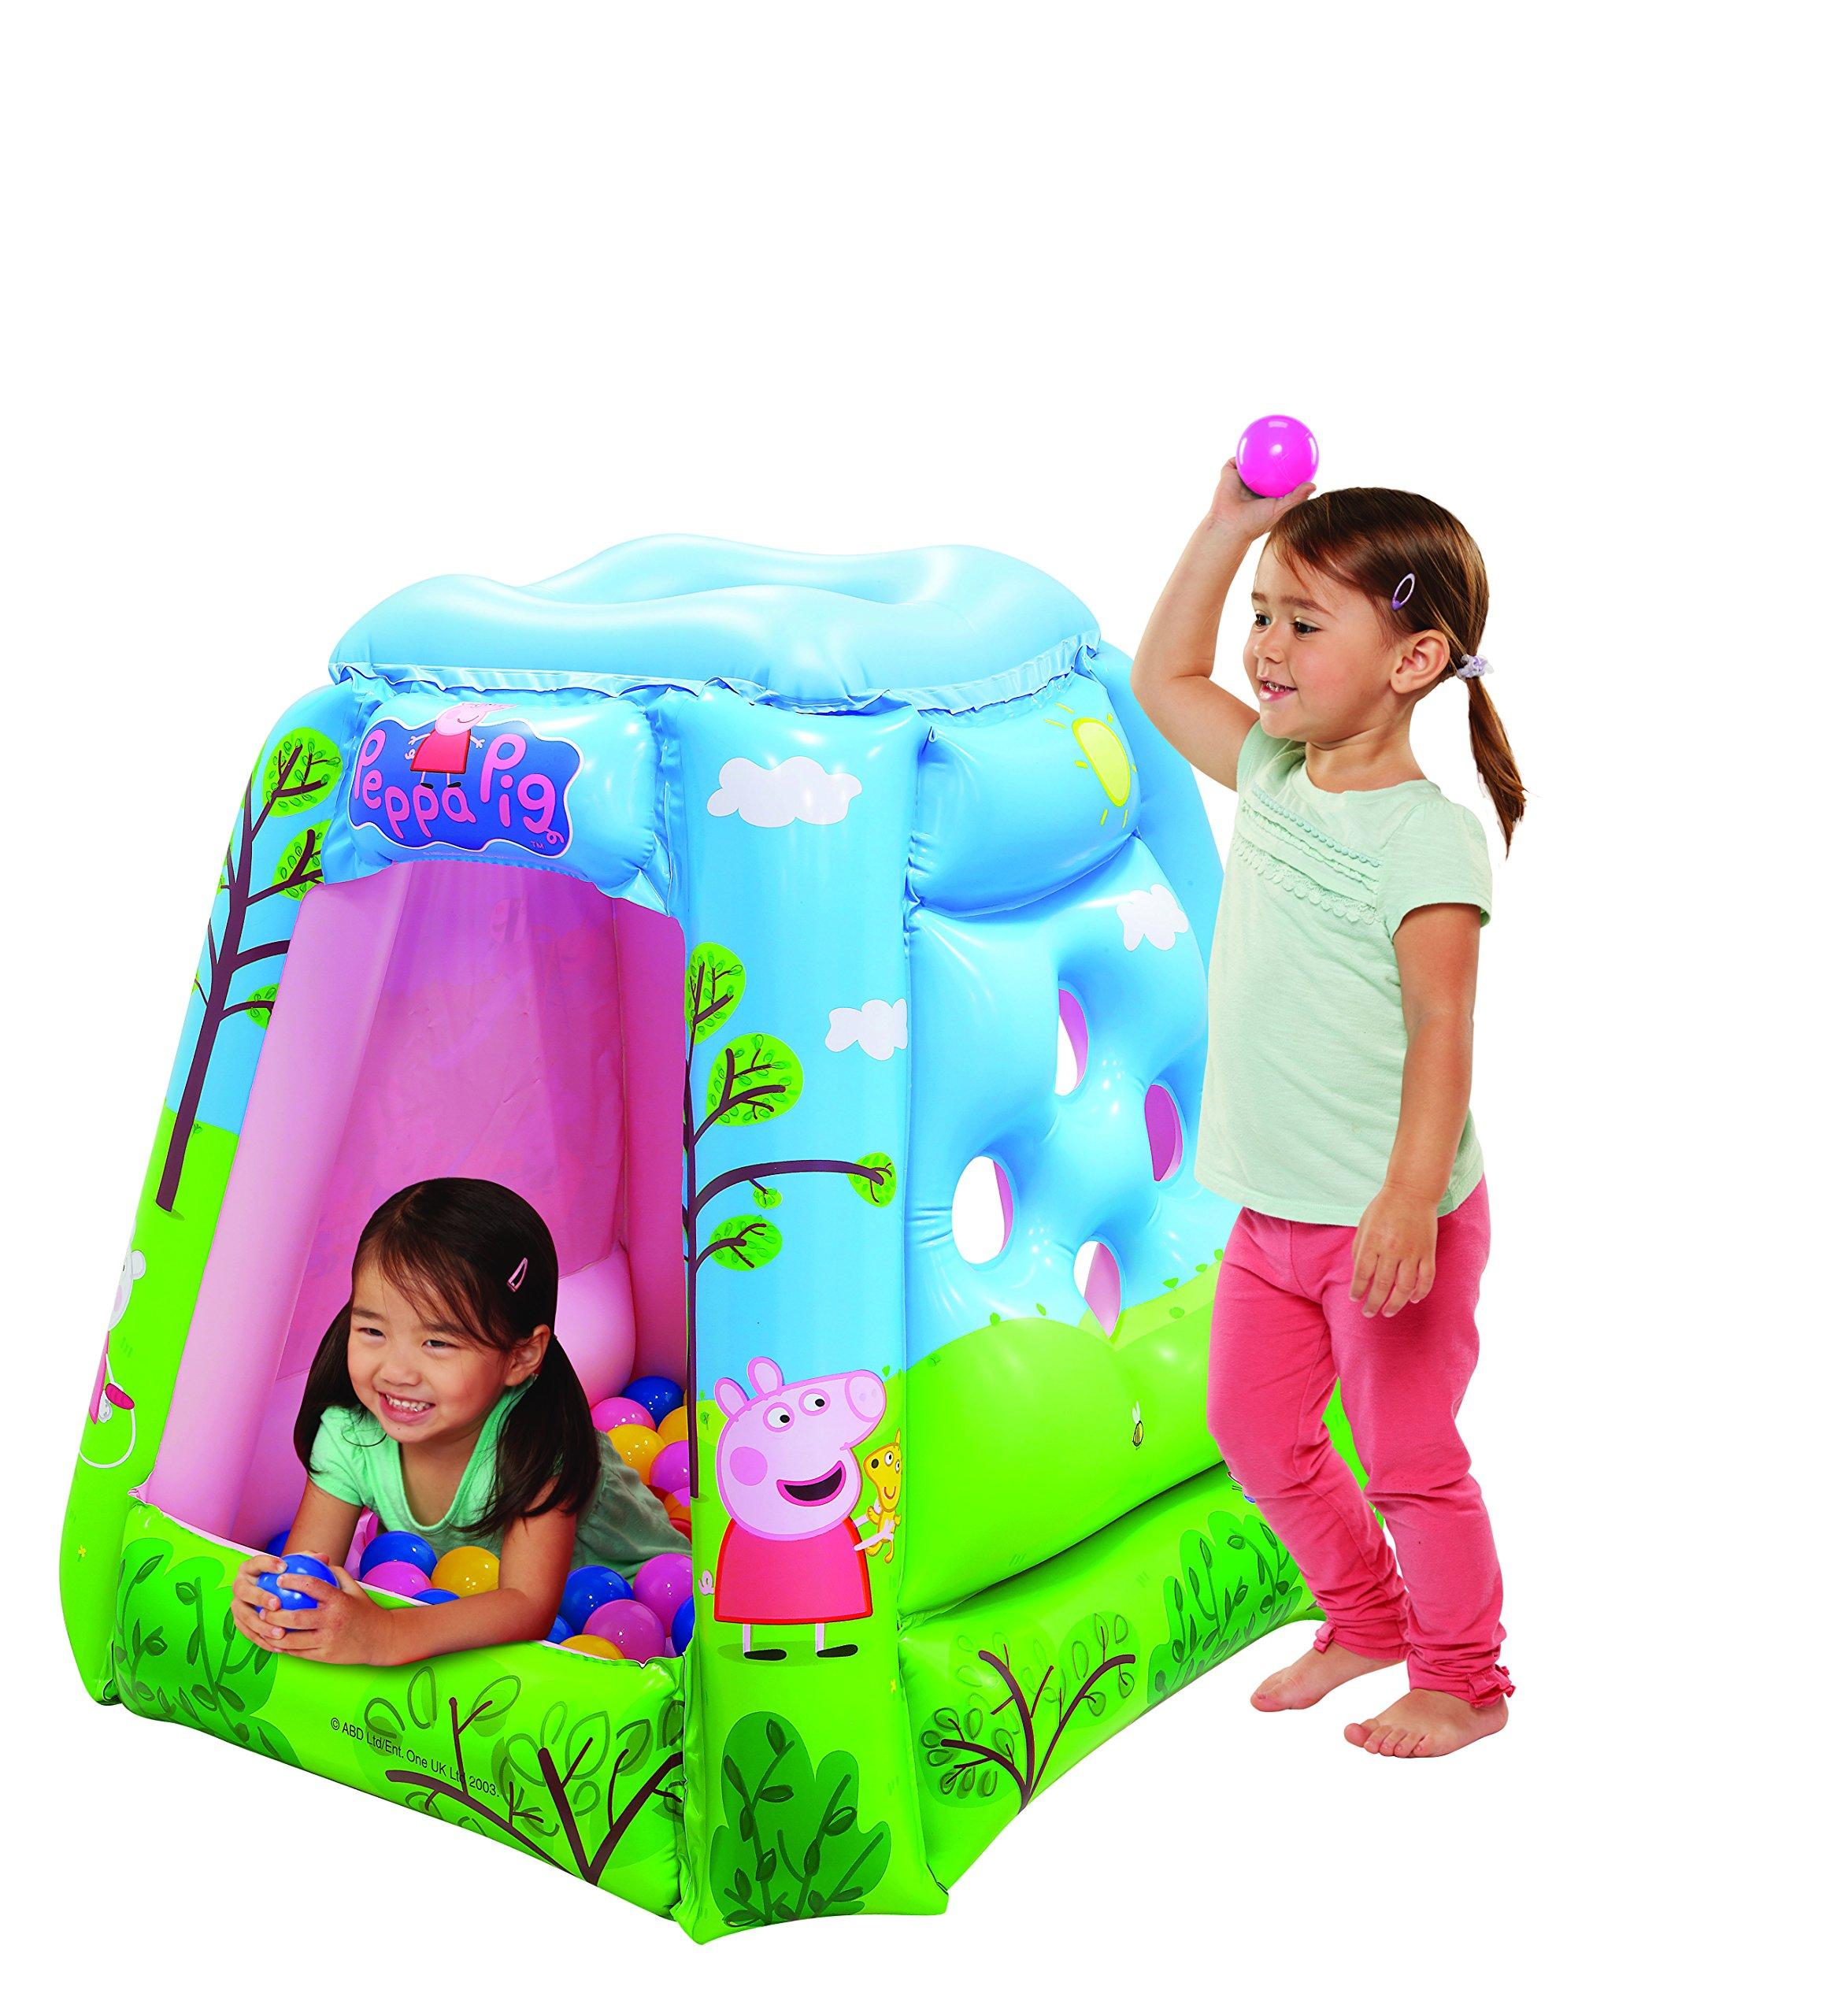 Peppa Pig Ball Pit, 1 Inflatable & 20 Sof-Flex Balls, Blue/Green, 37''W x 37''D x 34''H